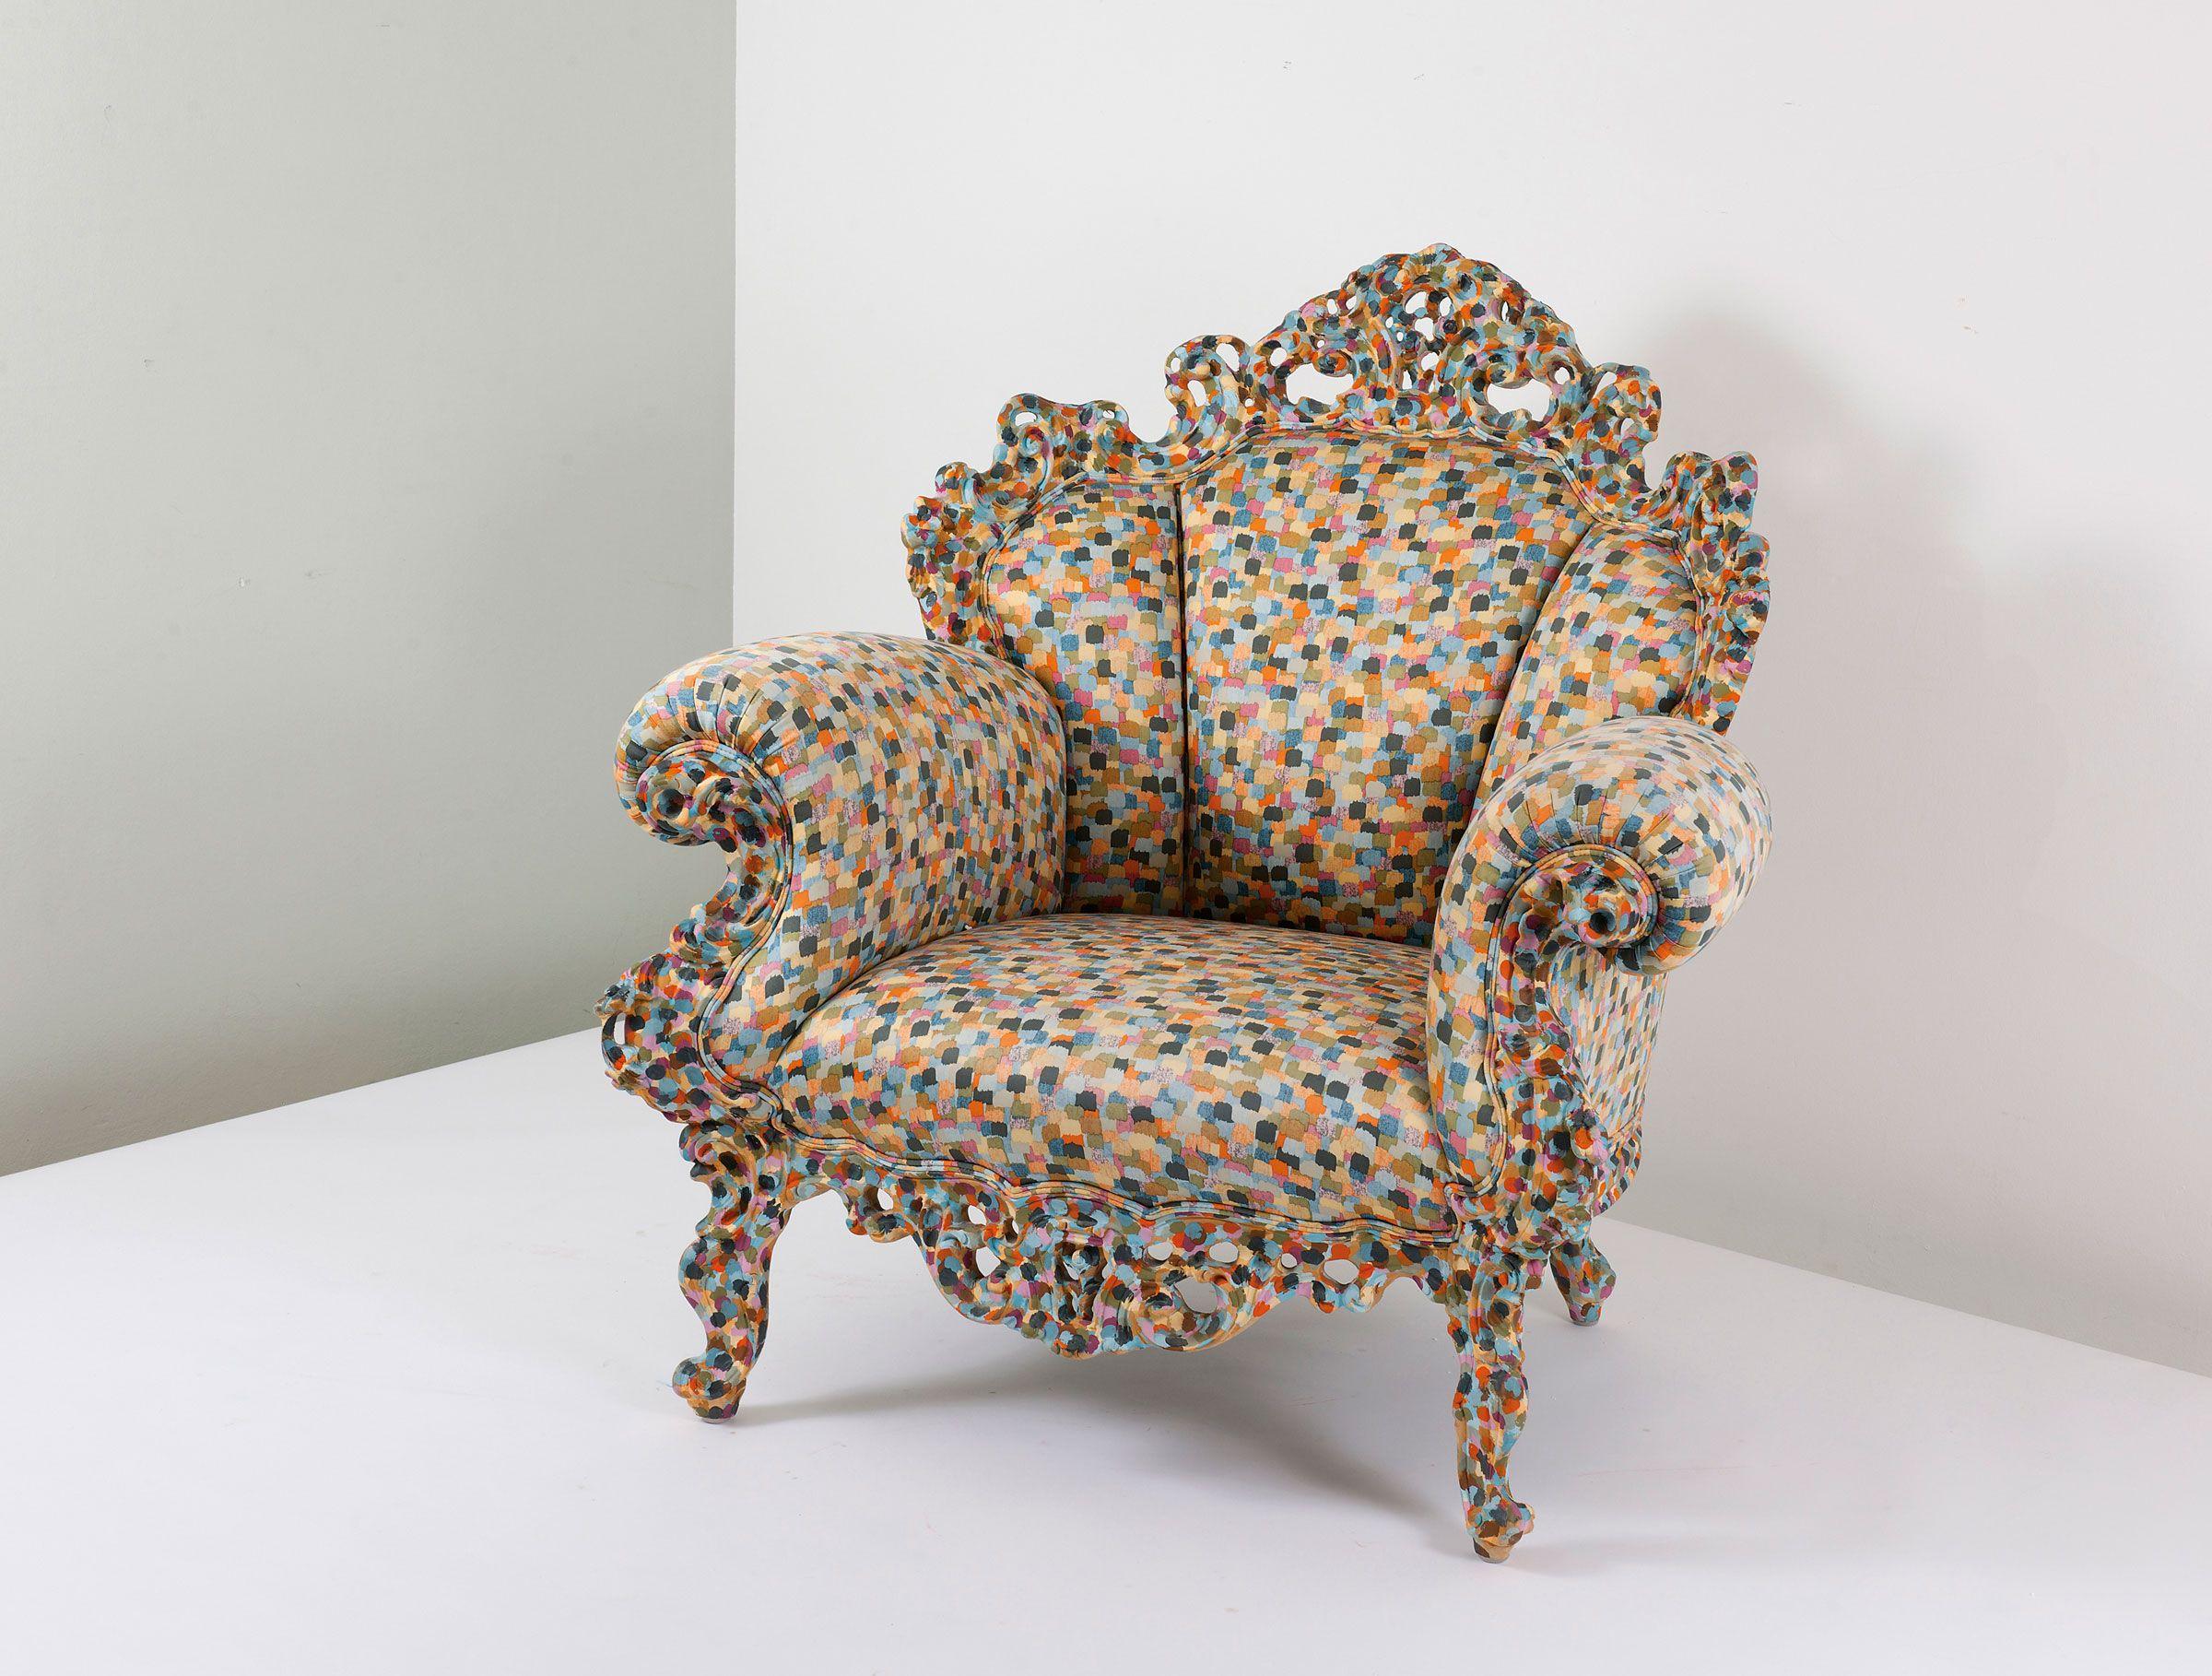 proust chair - Google 검색